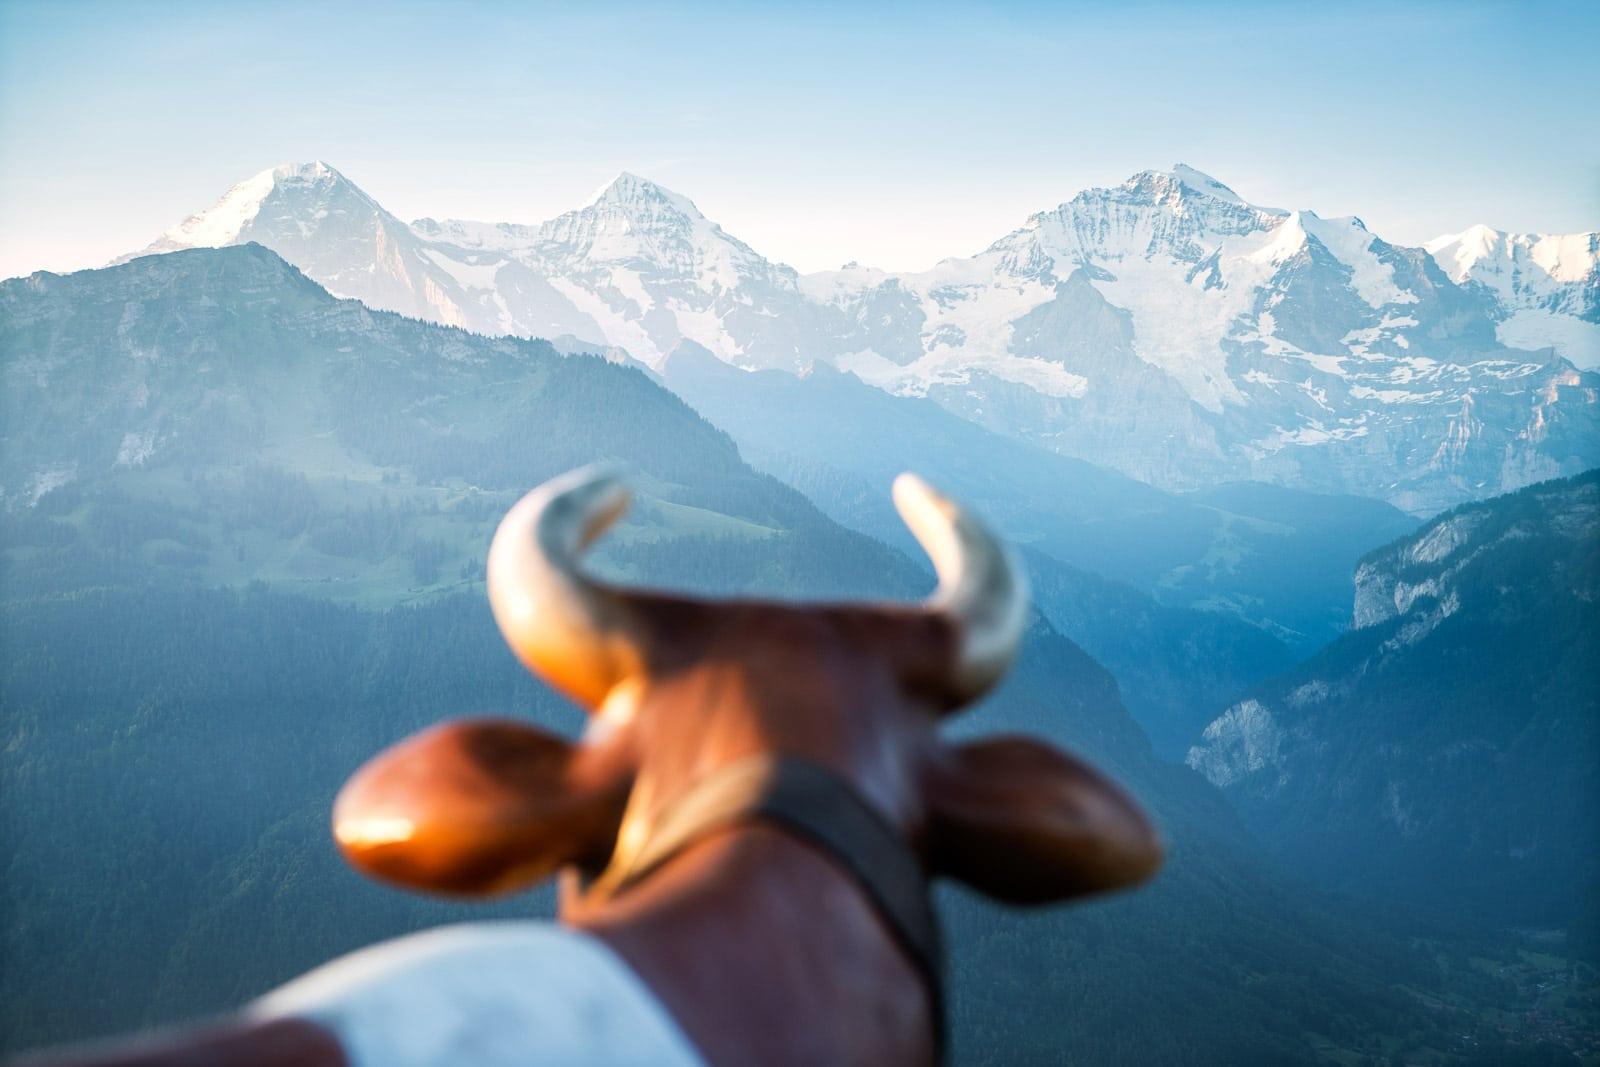 Ibex, or Steinbock, Switzerland